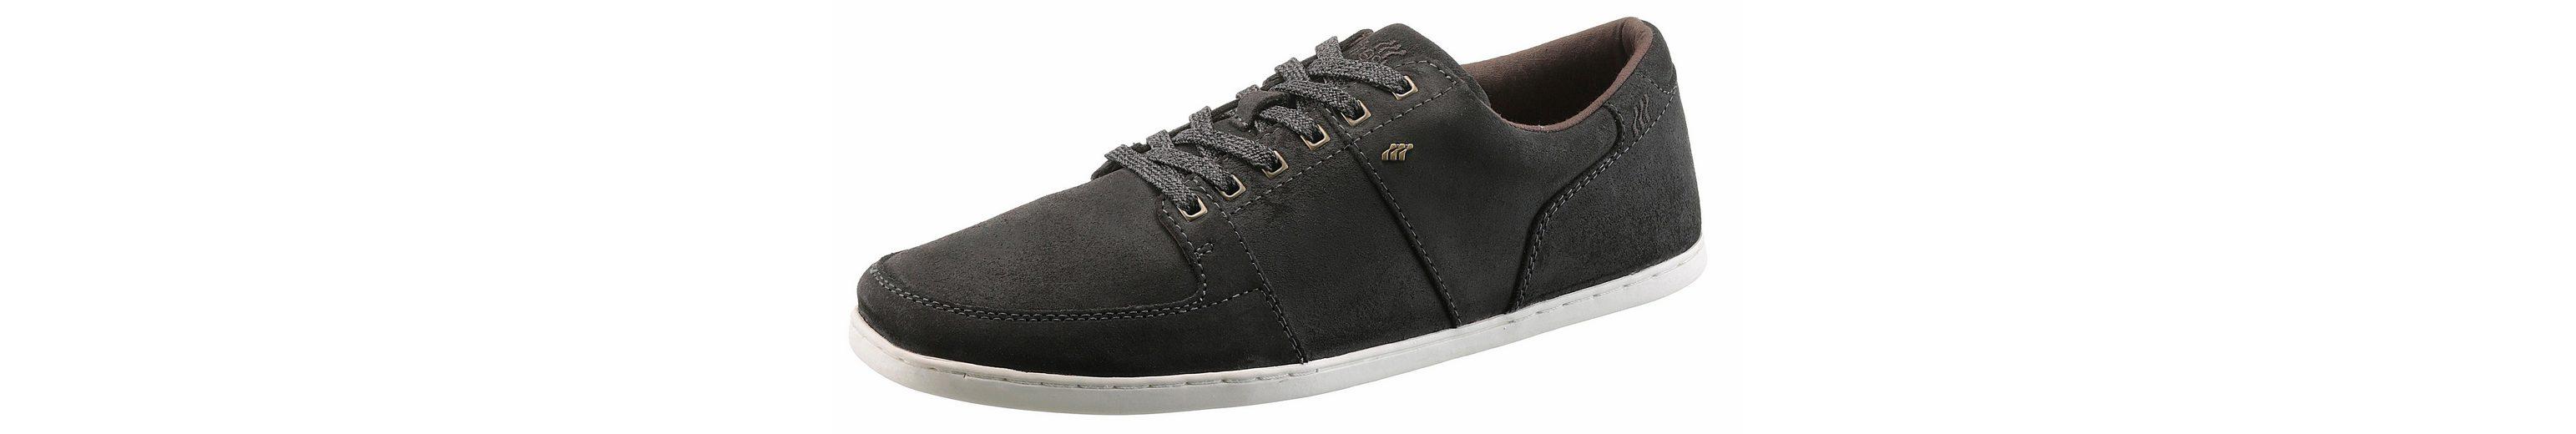 Boxfresh Spencer Sneaker, mit gepolstertem Schaftrand